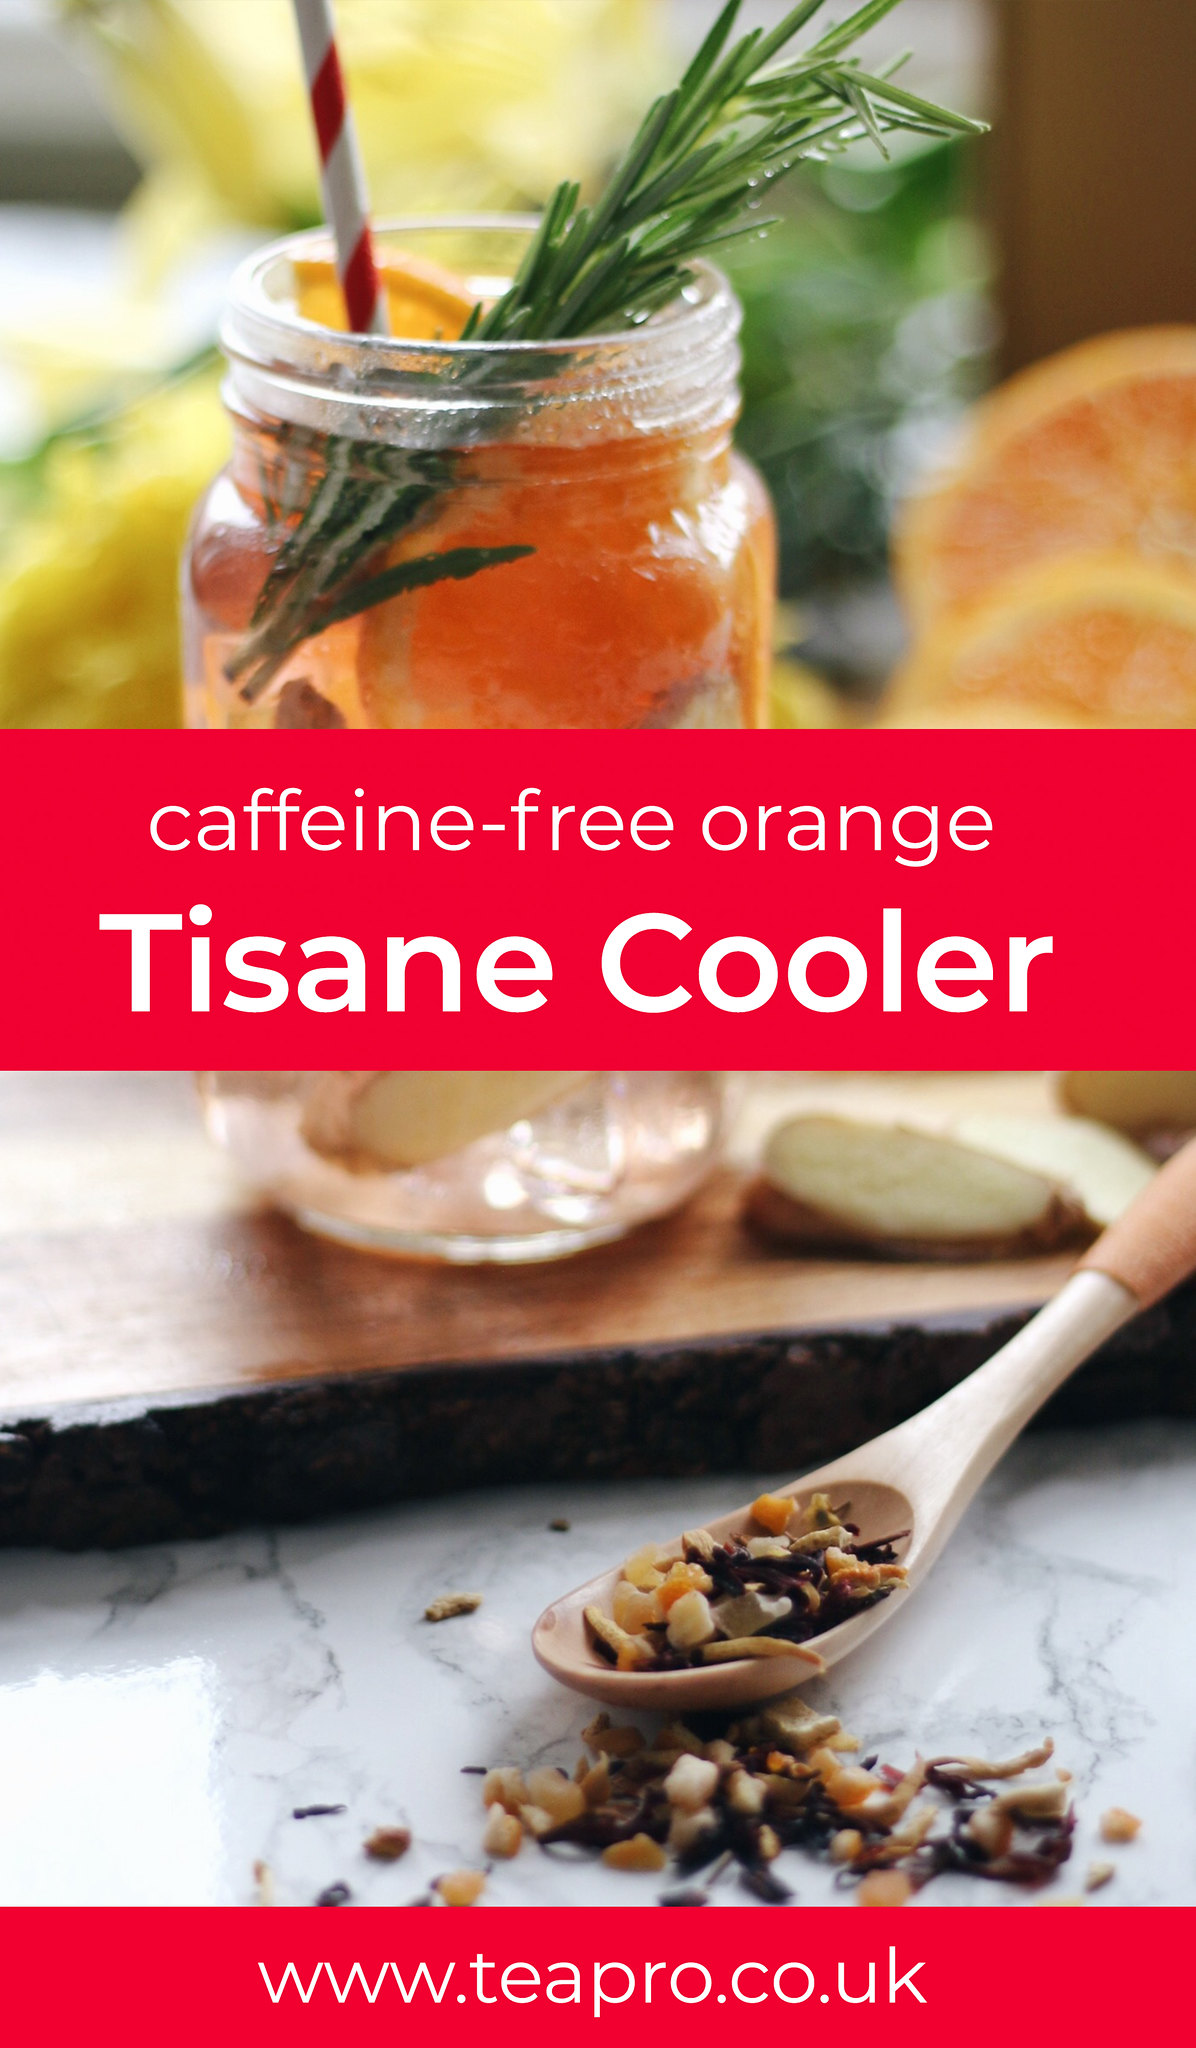 Teapro - Caffeine free orange tisane cooler recipe